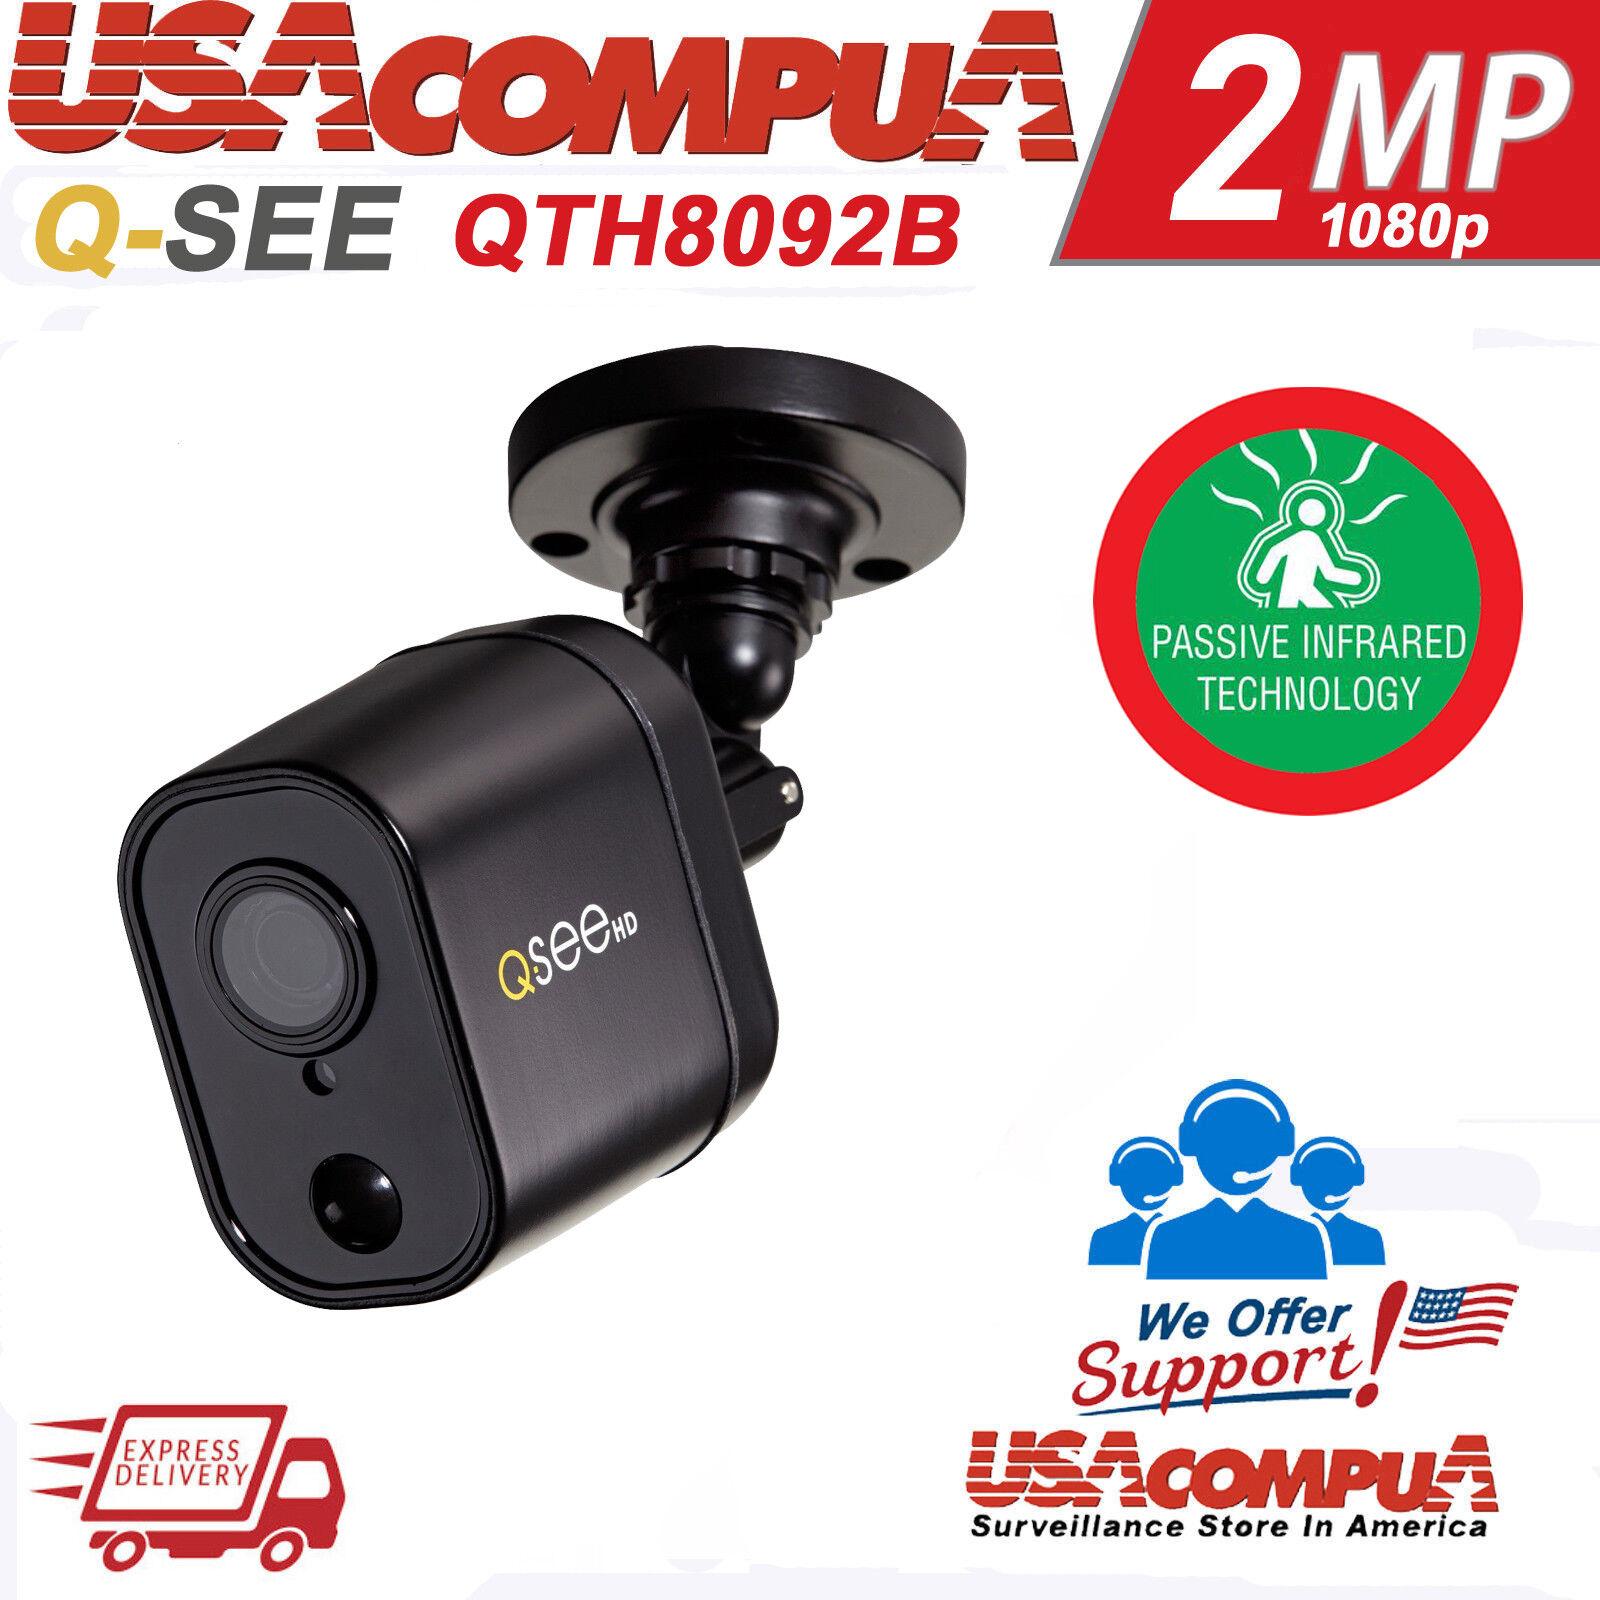 Q-See CAMERA 2MP QTH8092B PIR 1080P AHD BULLET CAMERA 1080p